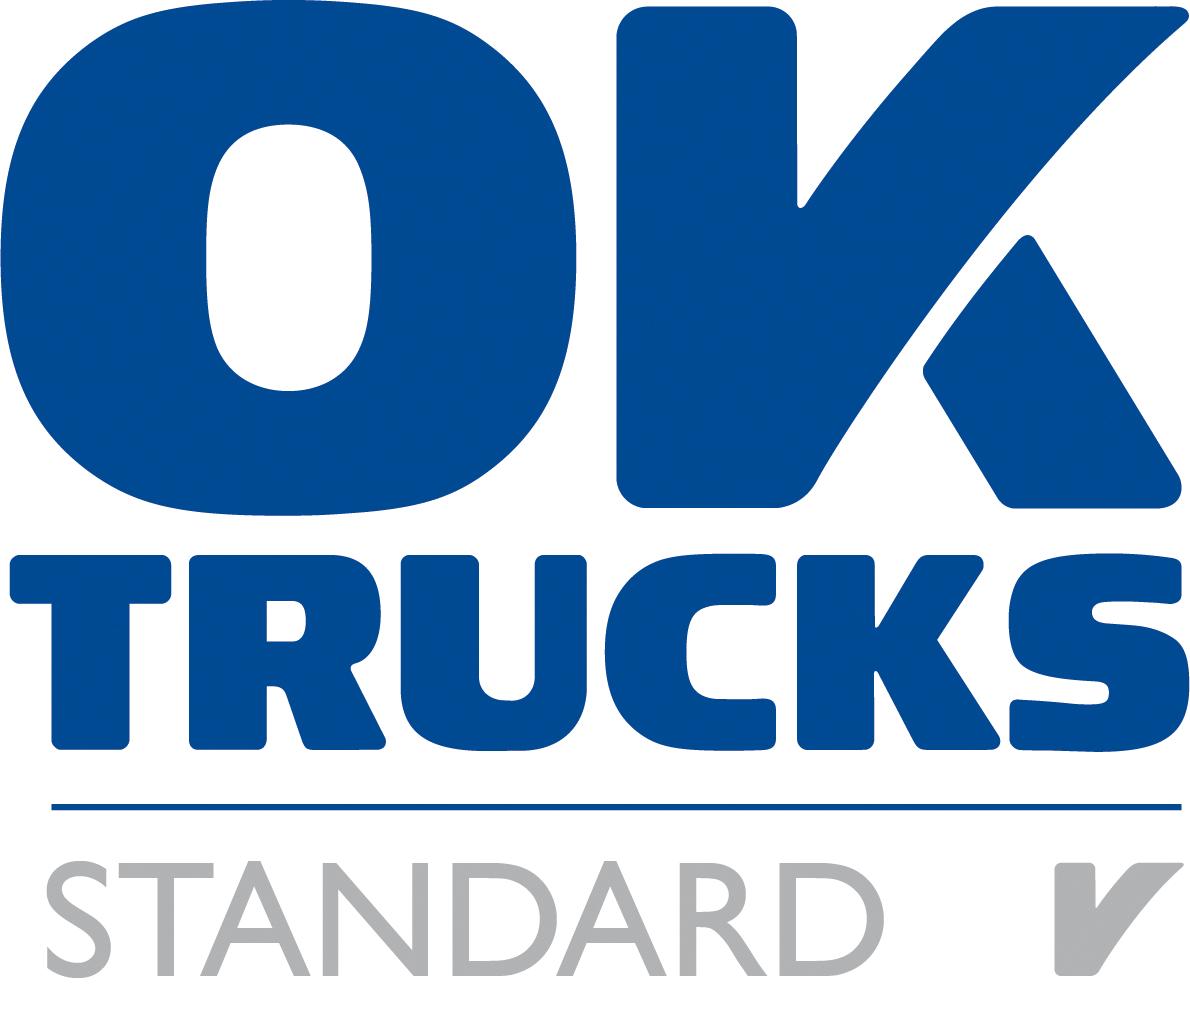 oktrucks logo standard